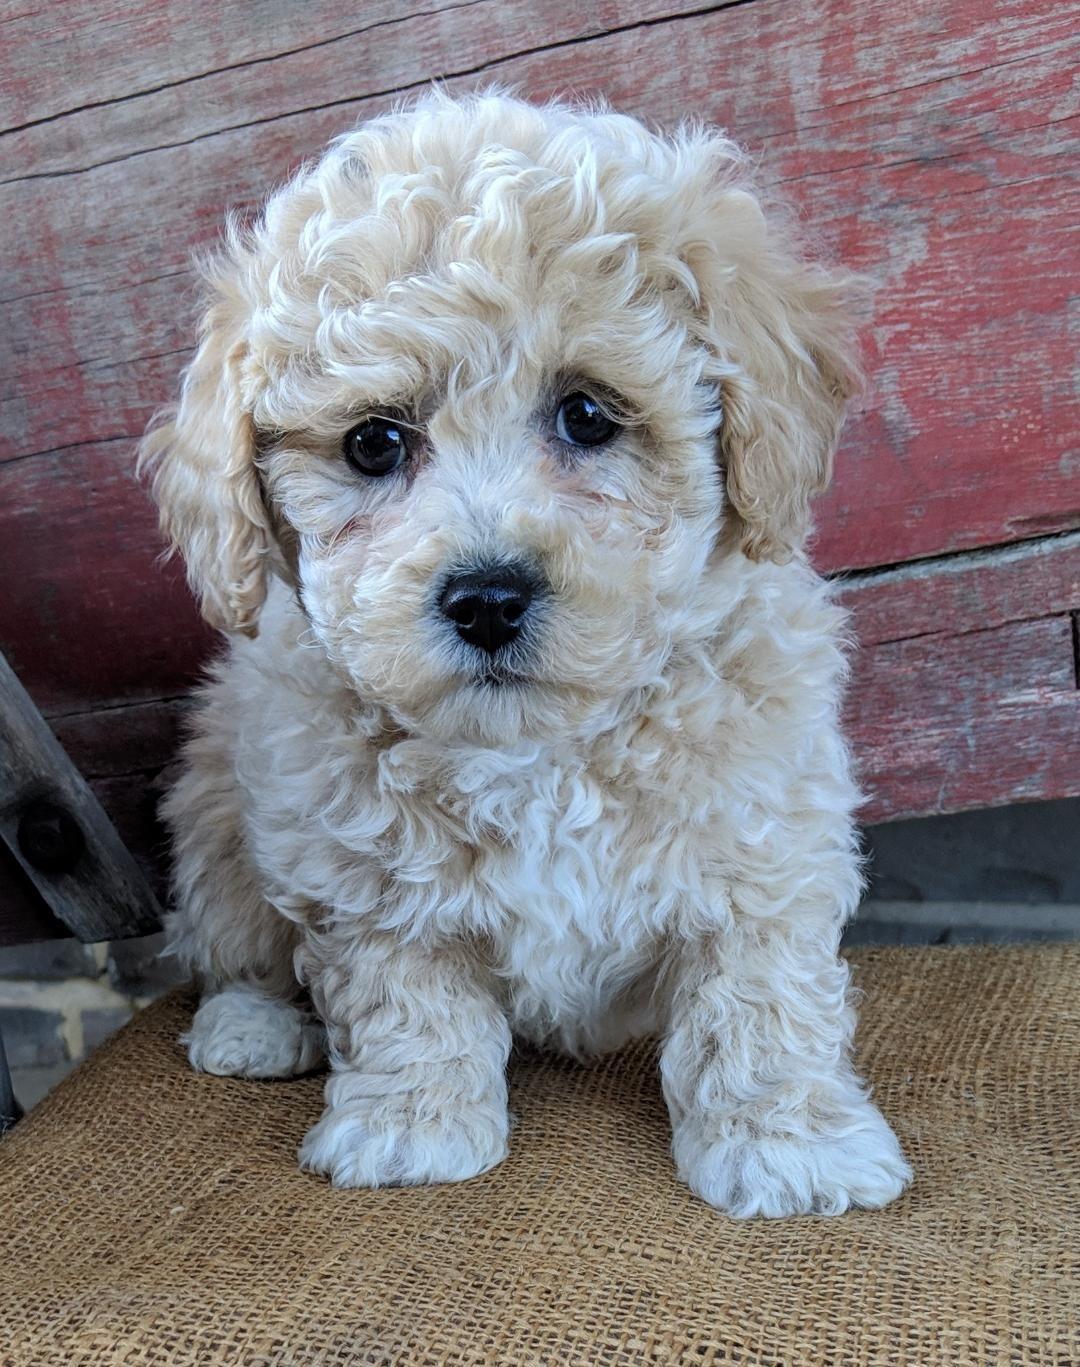 Faithful Bichpoo Dog Friends Cute Animals Puppies